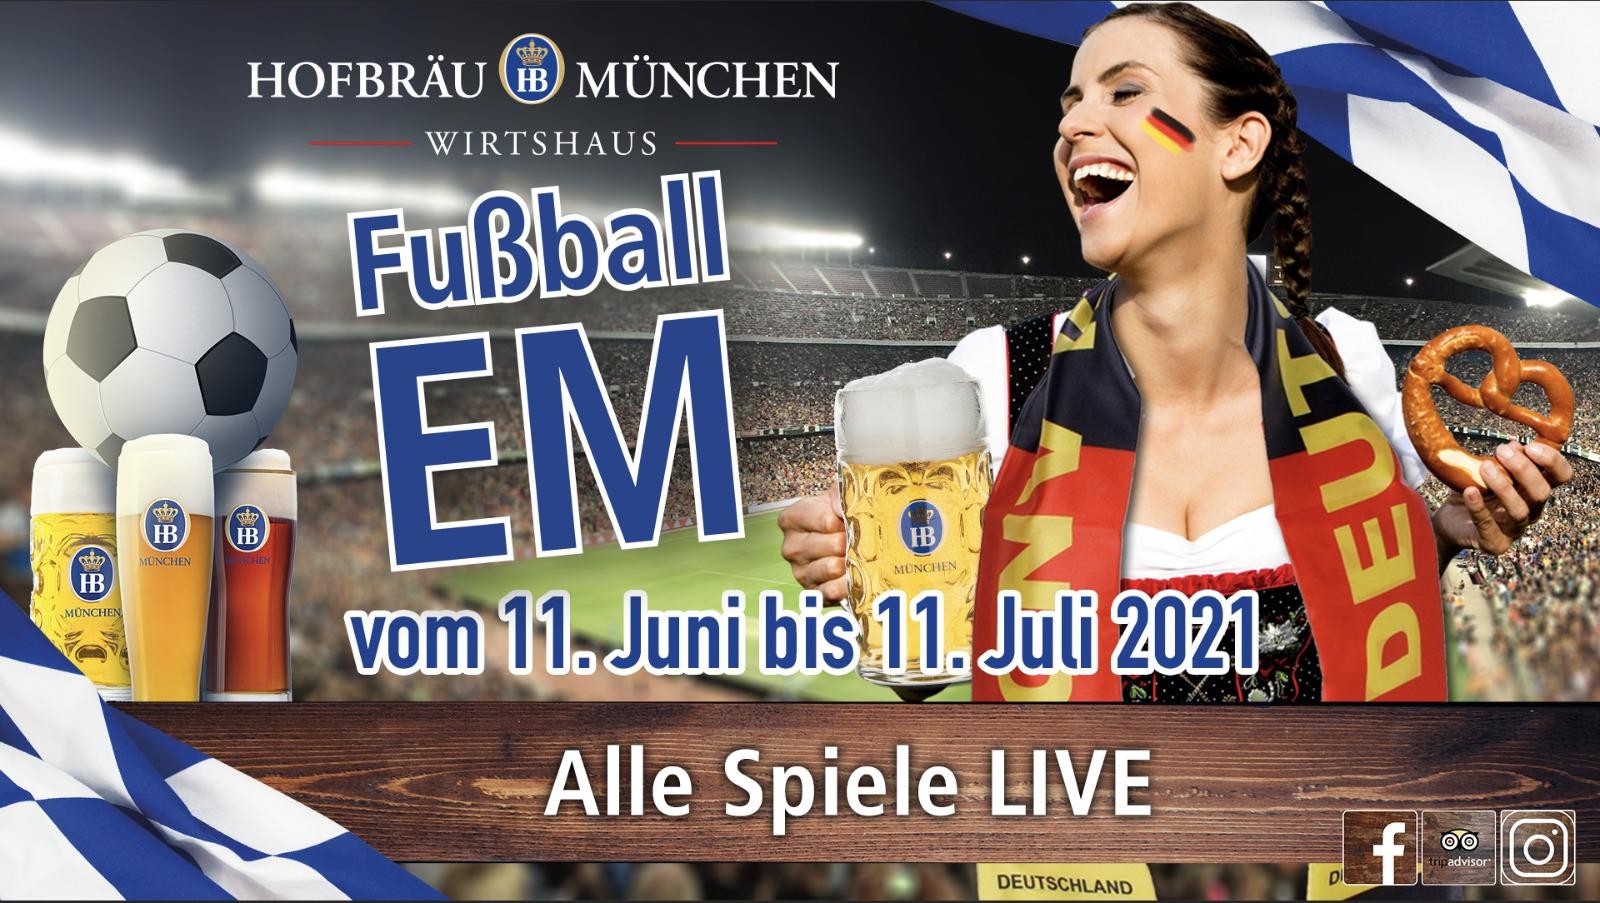 Fussball EM 2021 in Hamburg